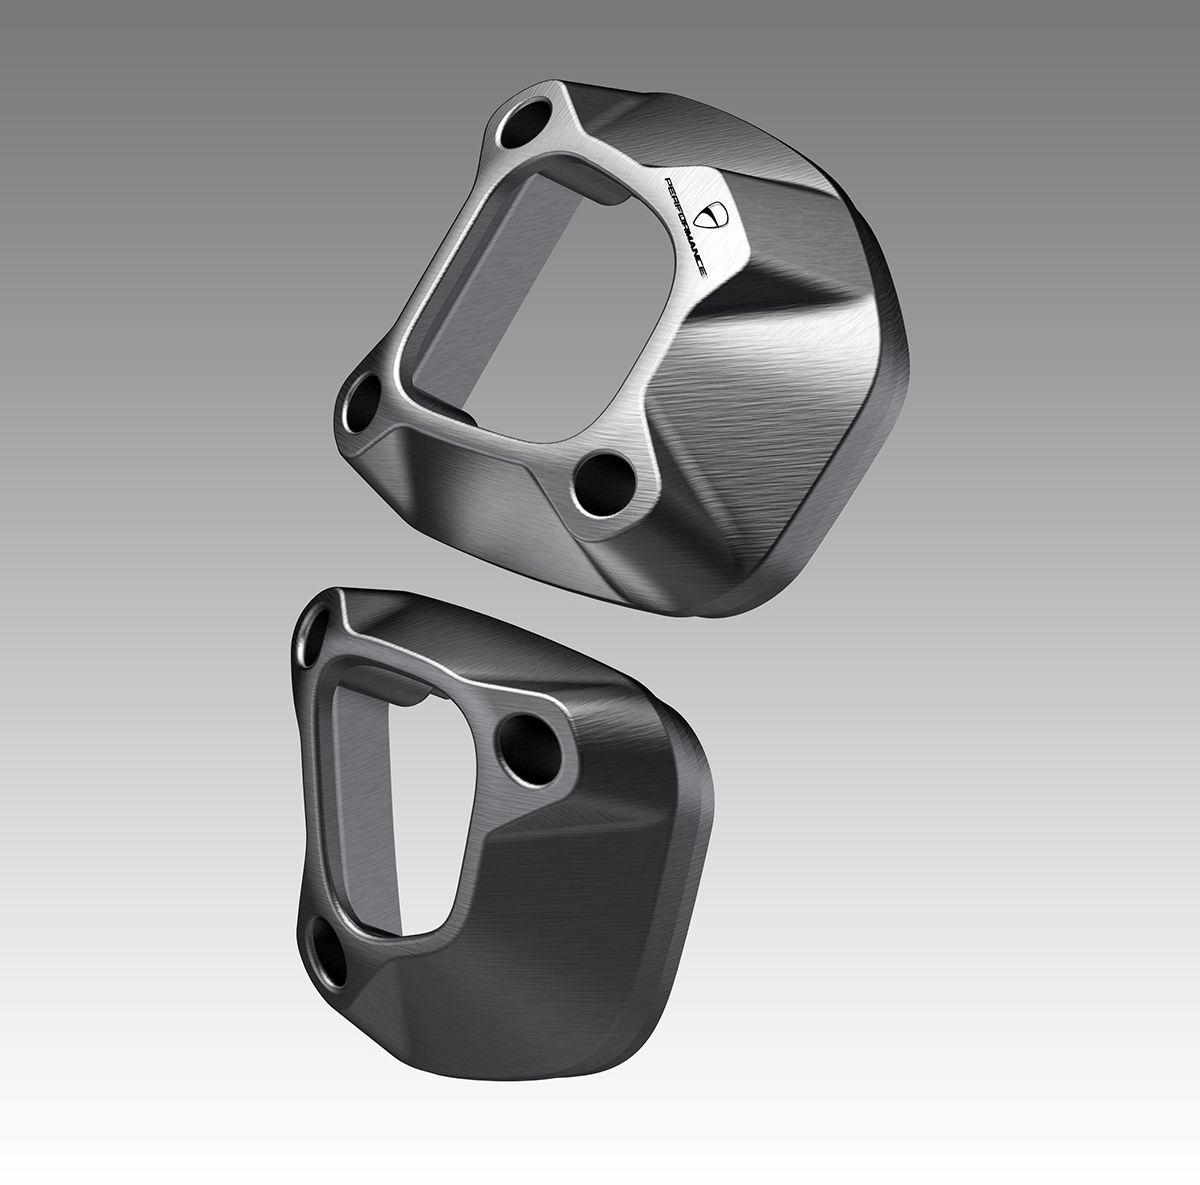 【DUCATI performance】排氣管尾蓋 type-approved - 「Webike-摩托百貨」